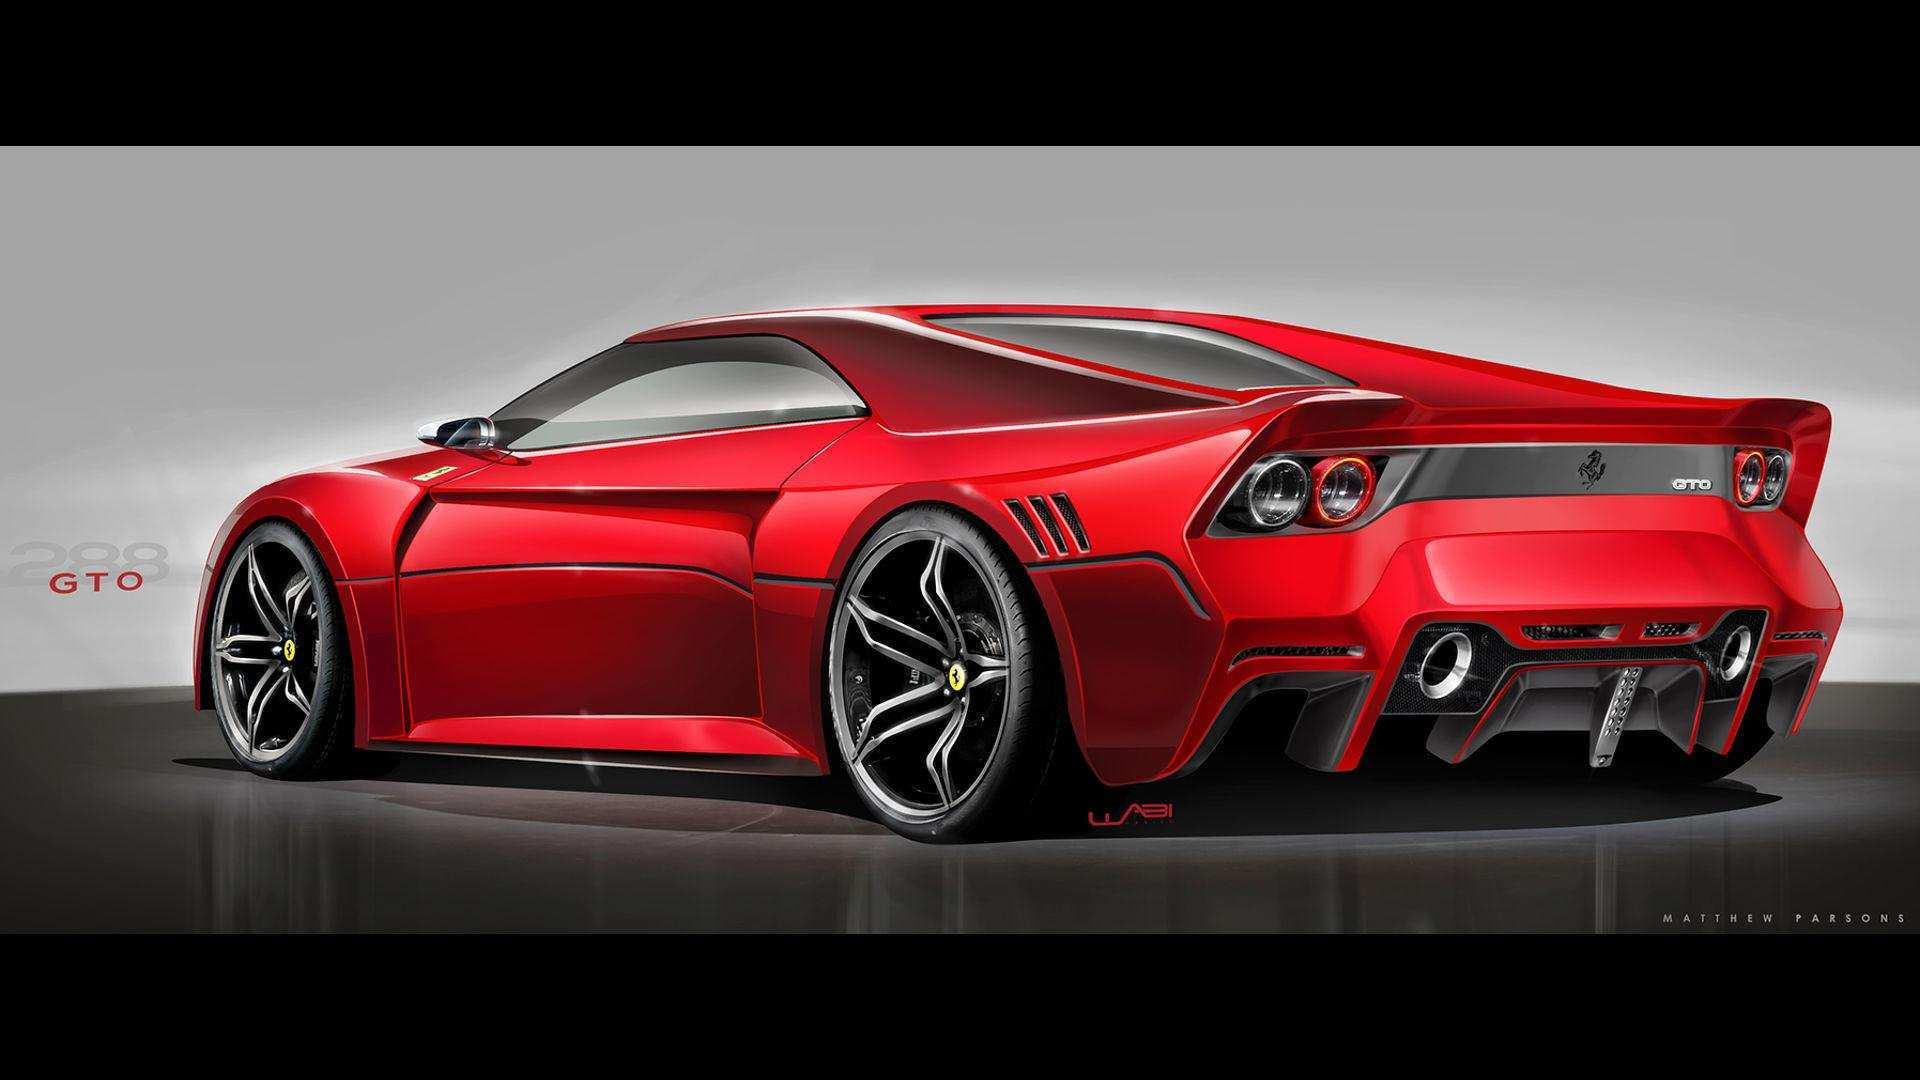 98 Best Review Ferrari 2020 Gto Wallpaper for Ferrari 2020 Gto